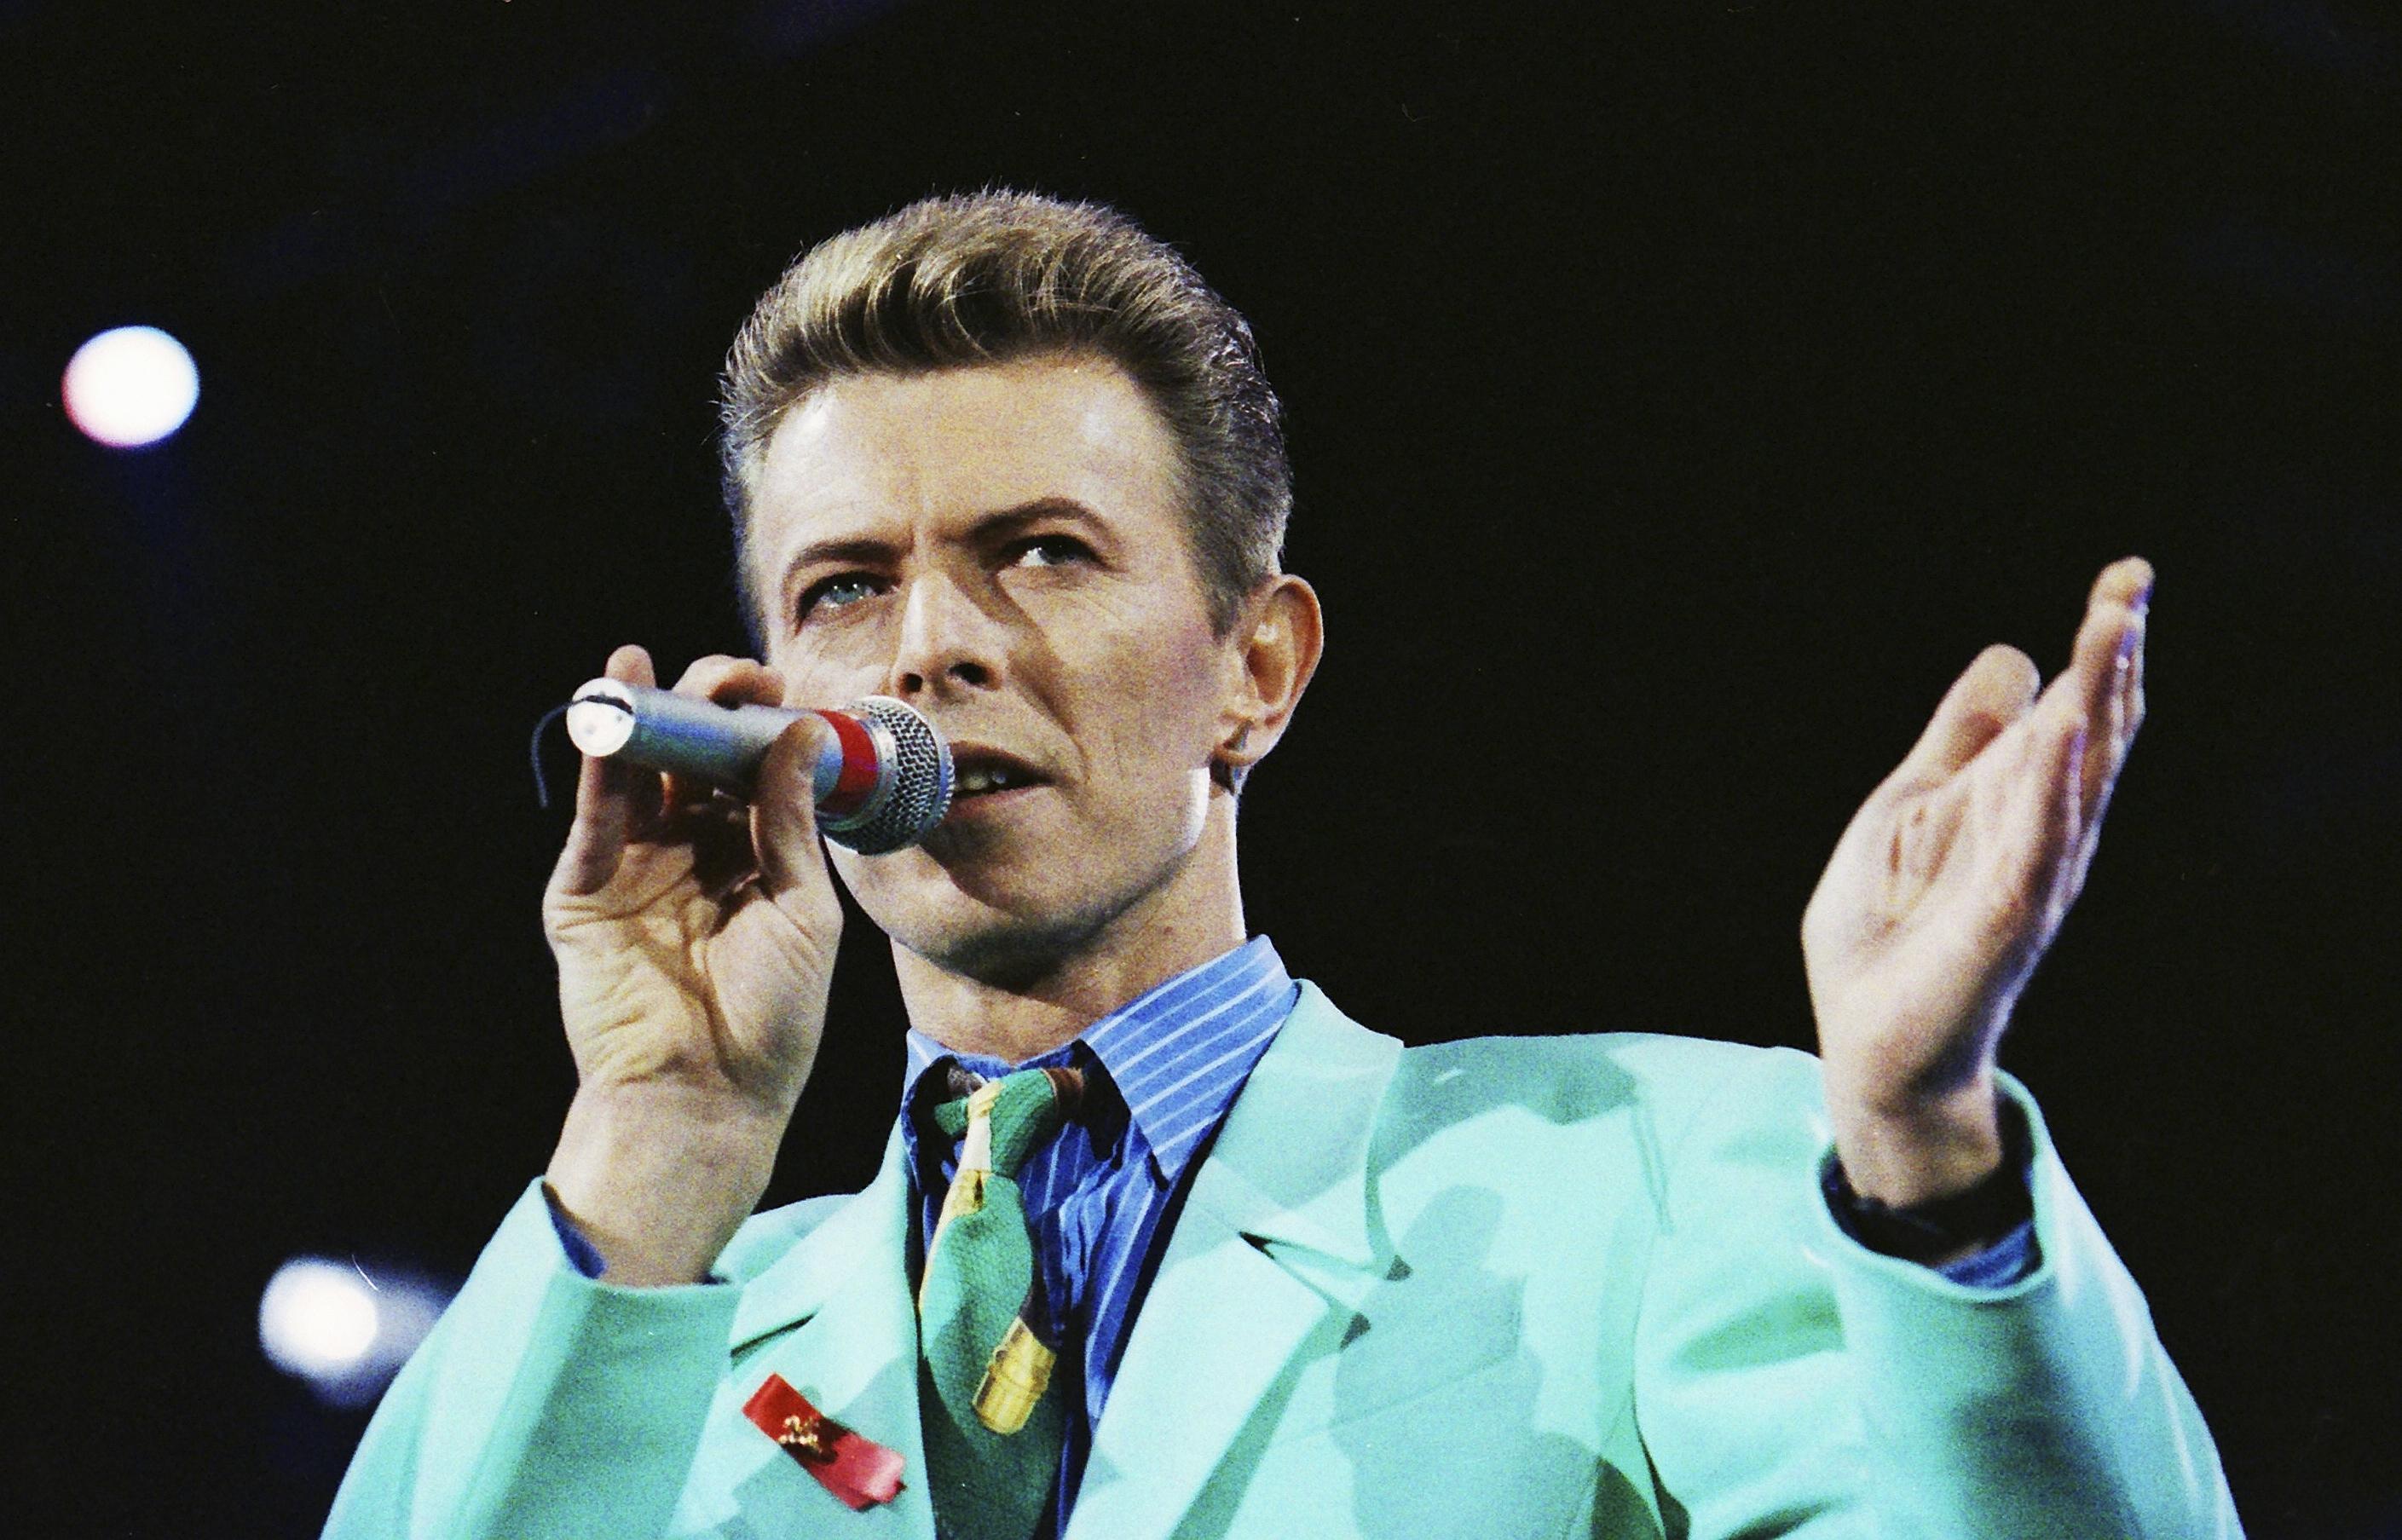 Philadelphia celebrates David Bowie starting January 5th.